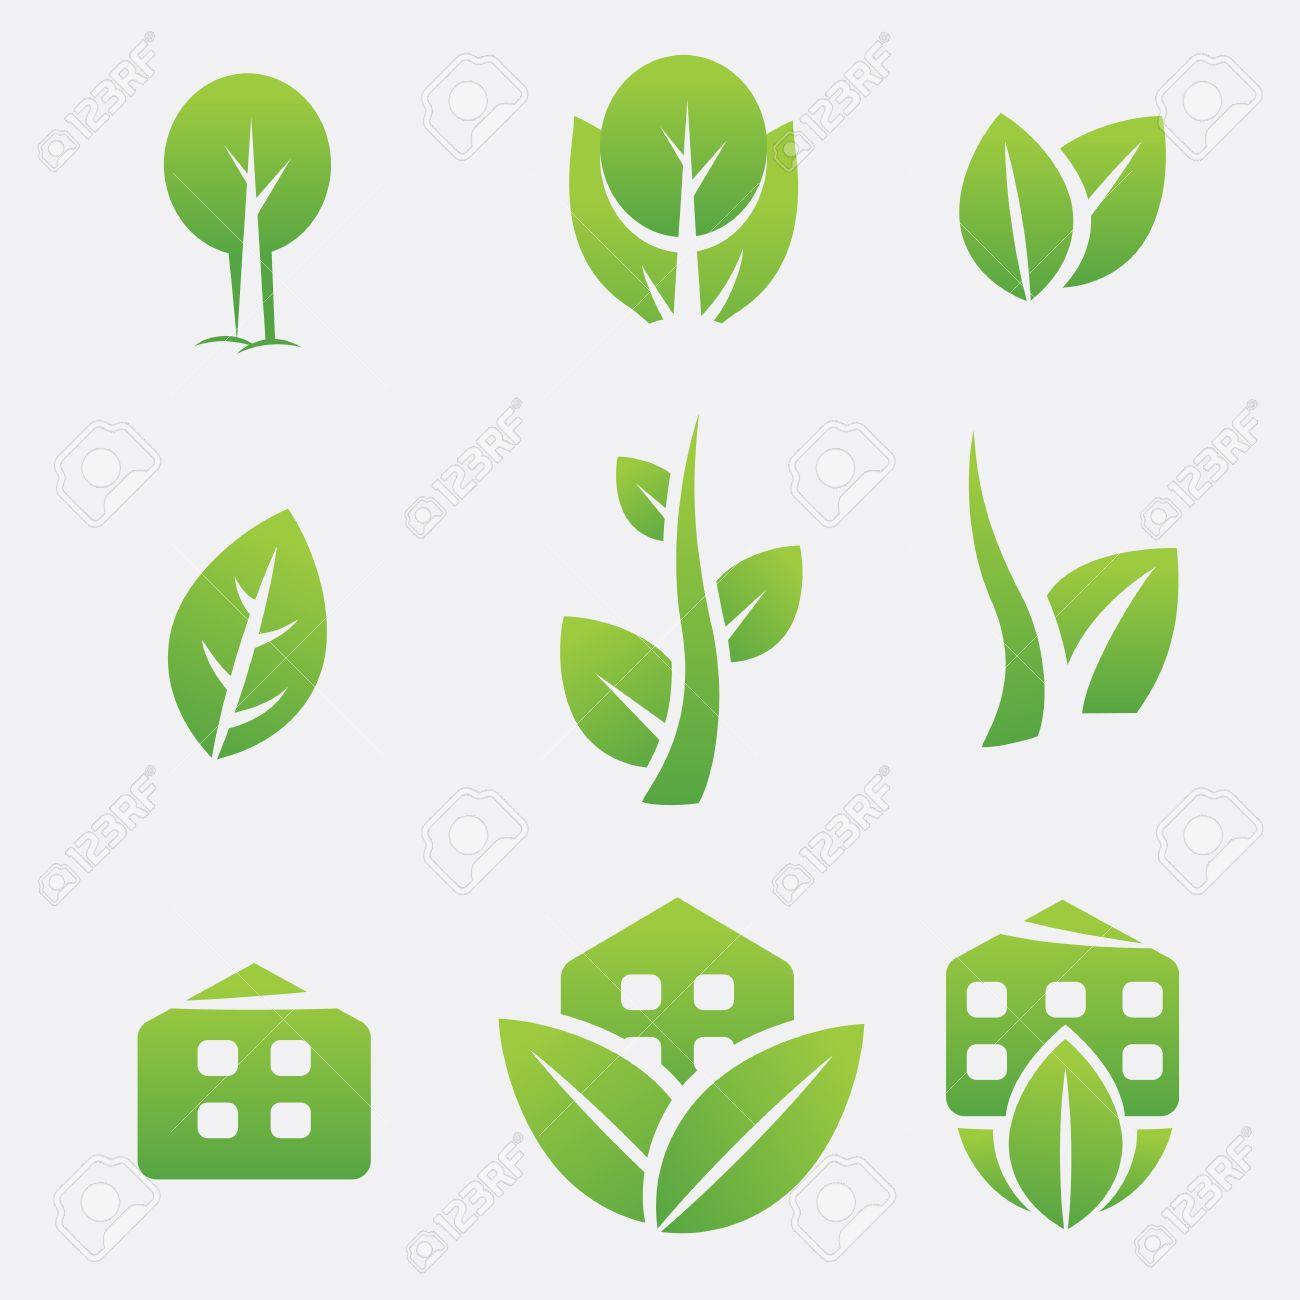 Green eco icons Stock Vector - 14809871